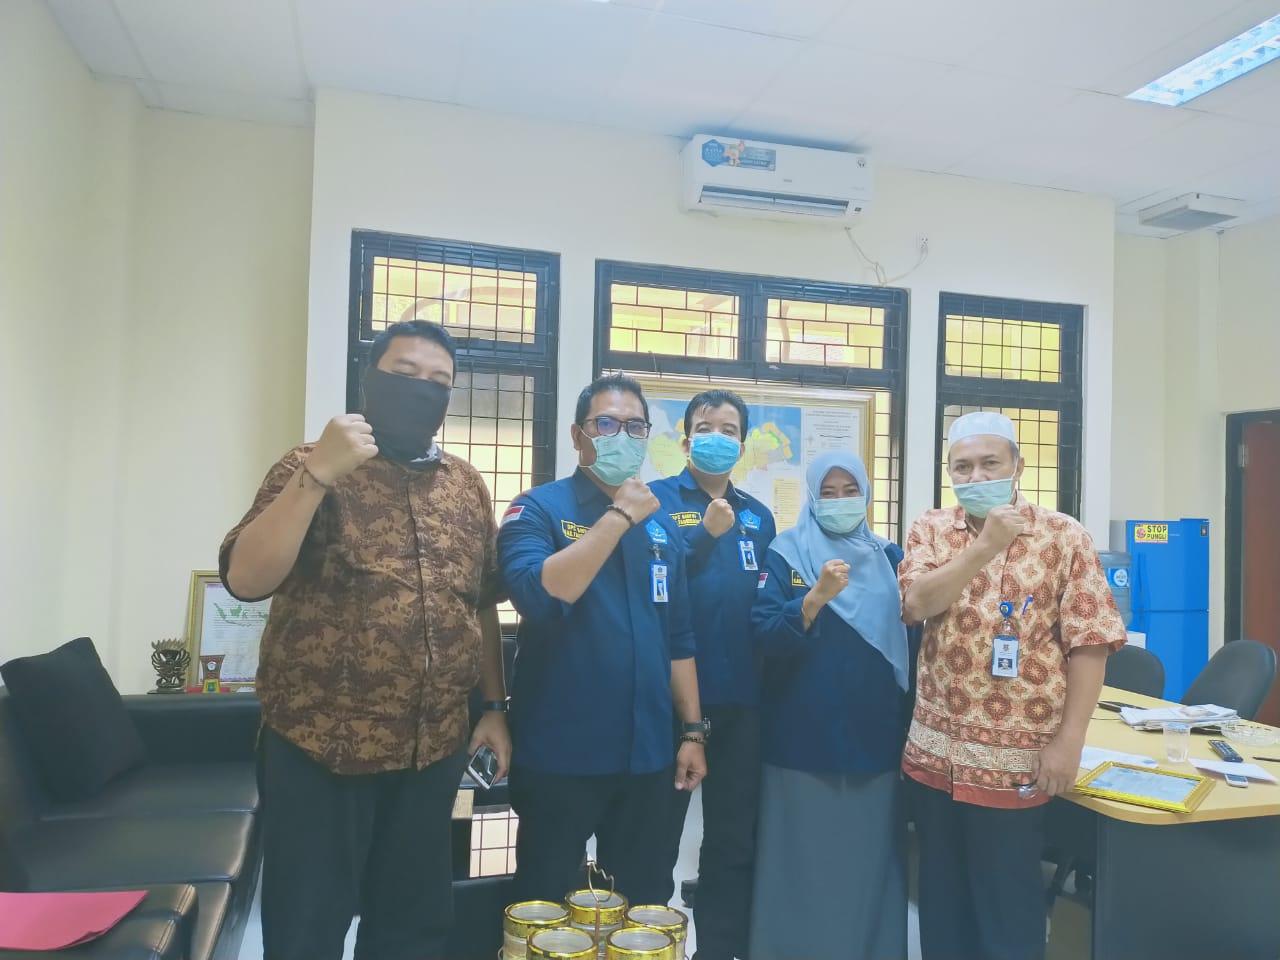 Sambangi Kantor Kesbangpol, GMPRI Jemput Bola Bantu Pemda Kabupaten Tangerang Tangani Covid-19